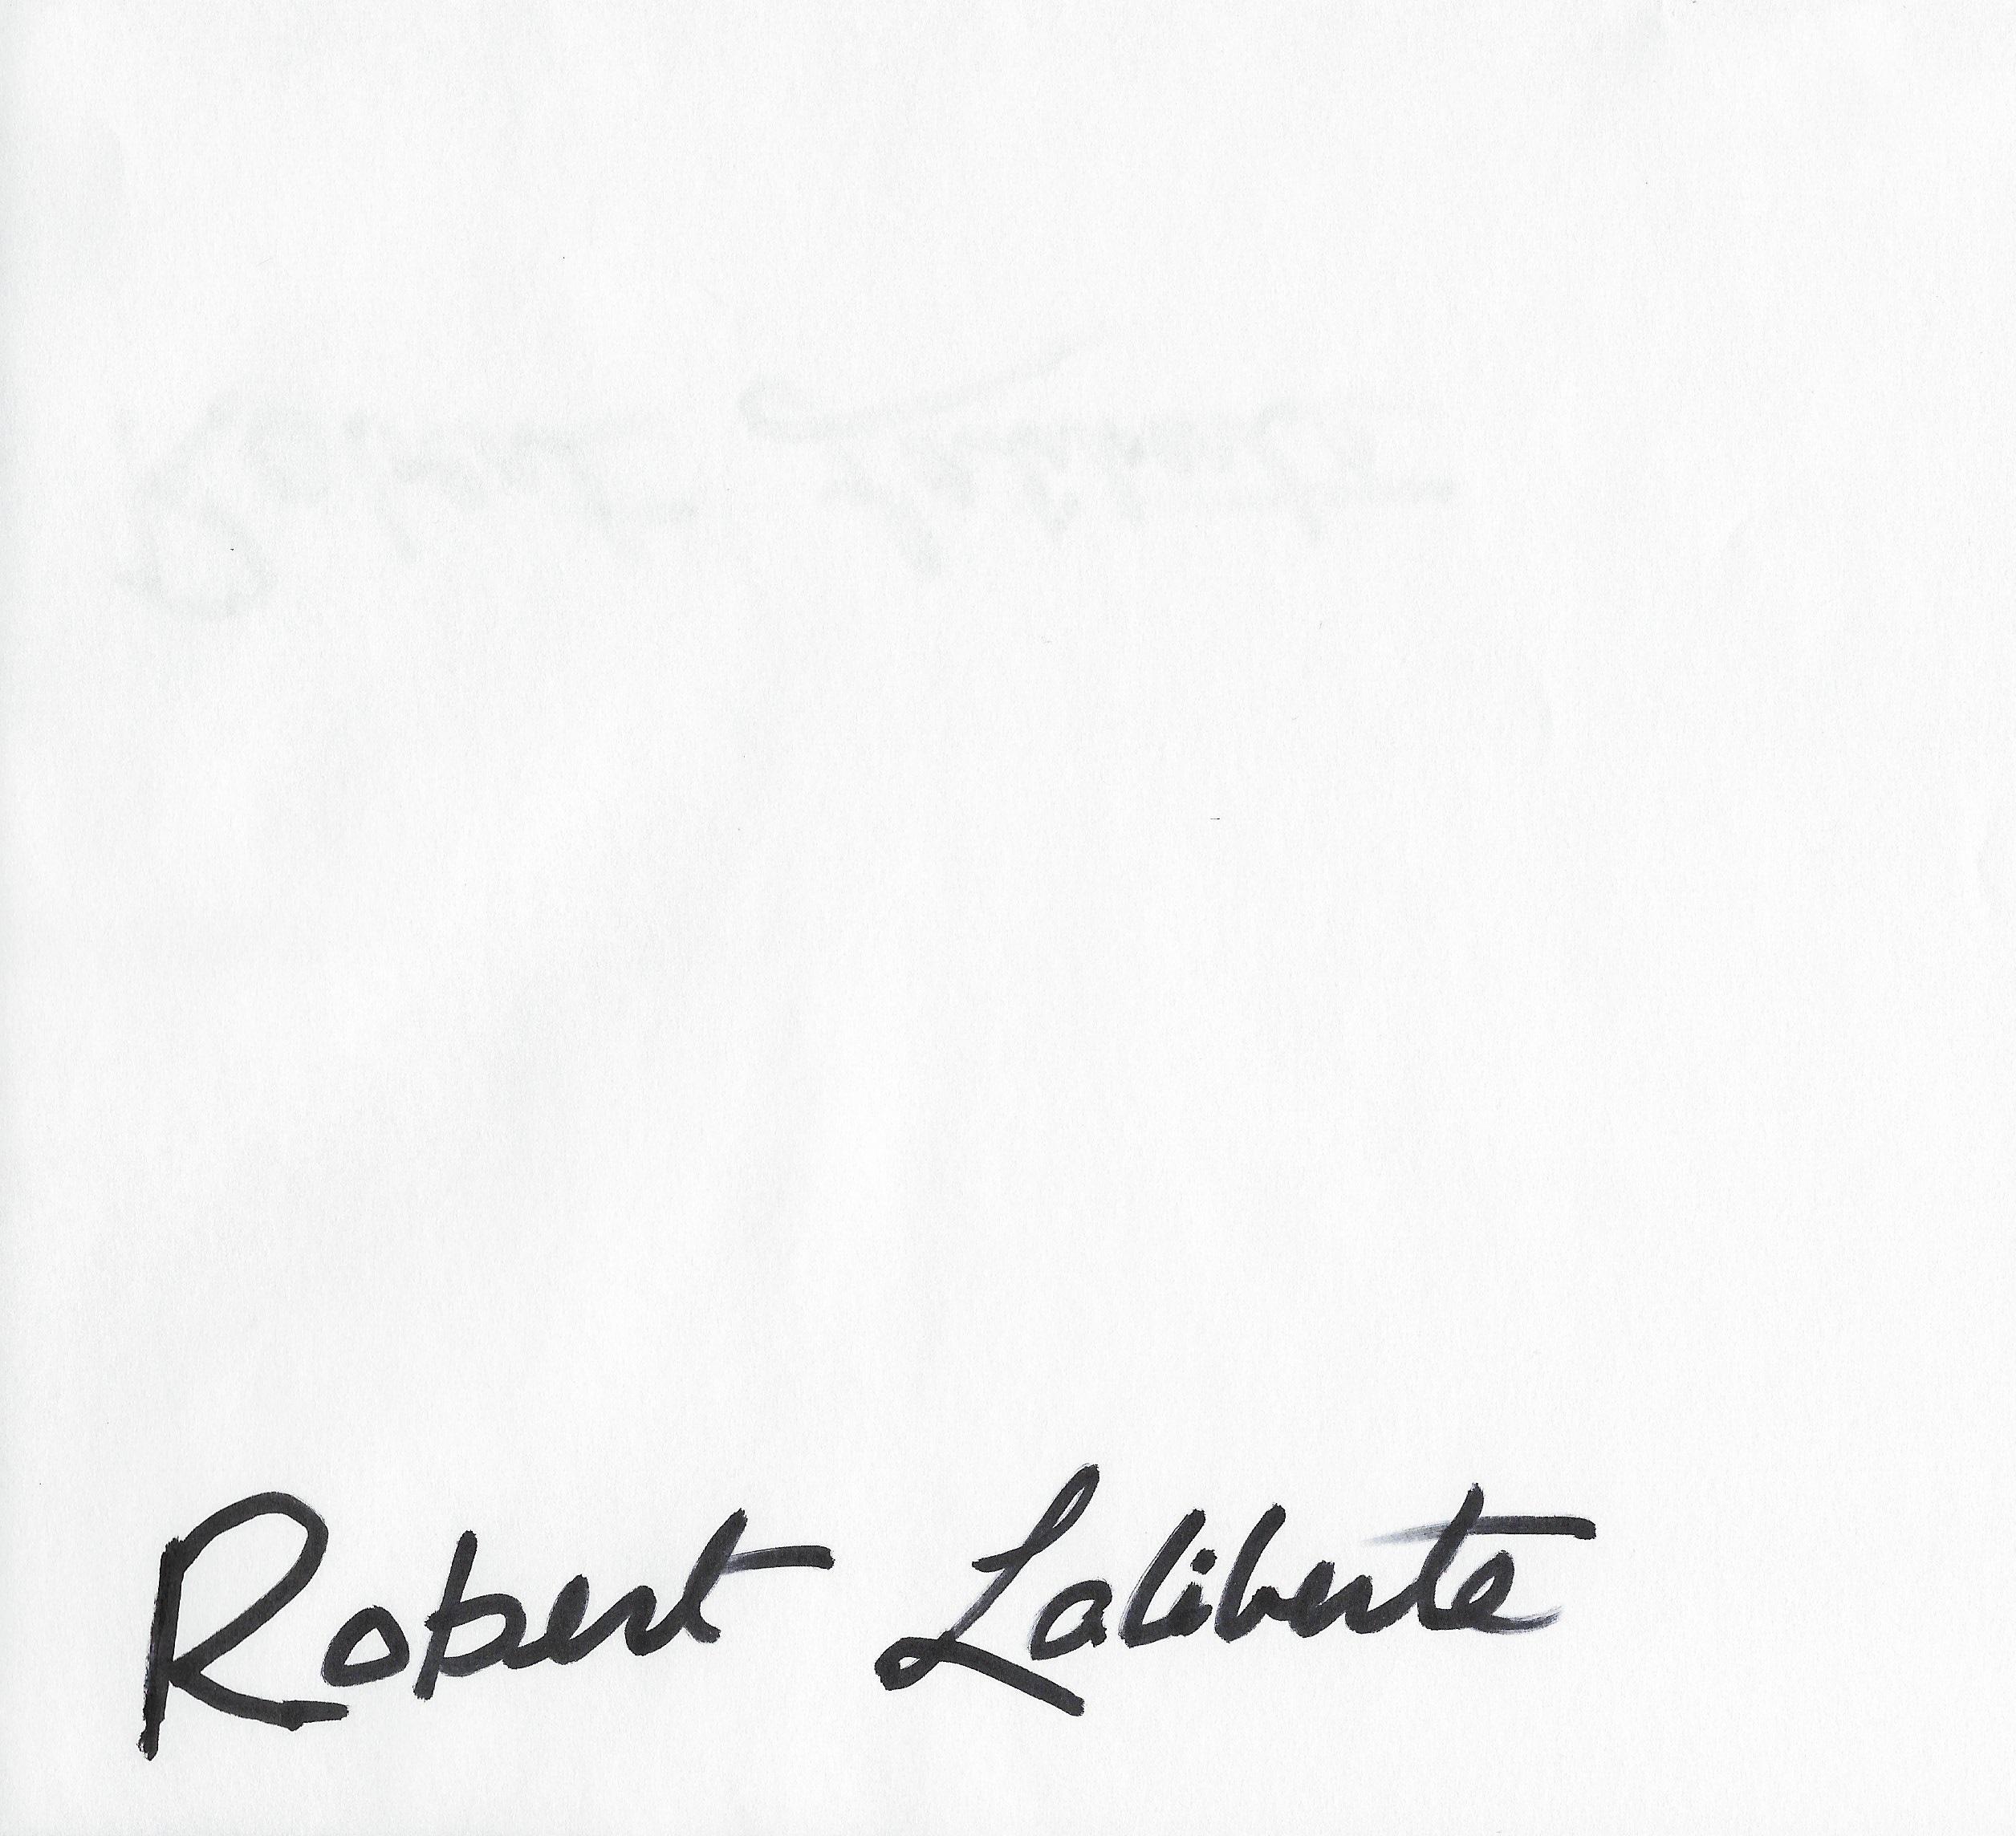 Robert laliberte Signature